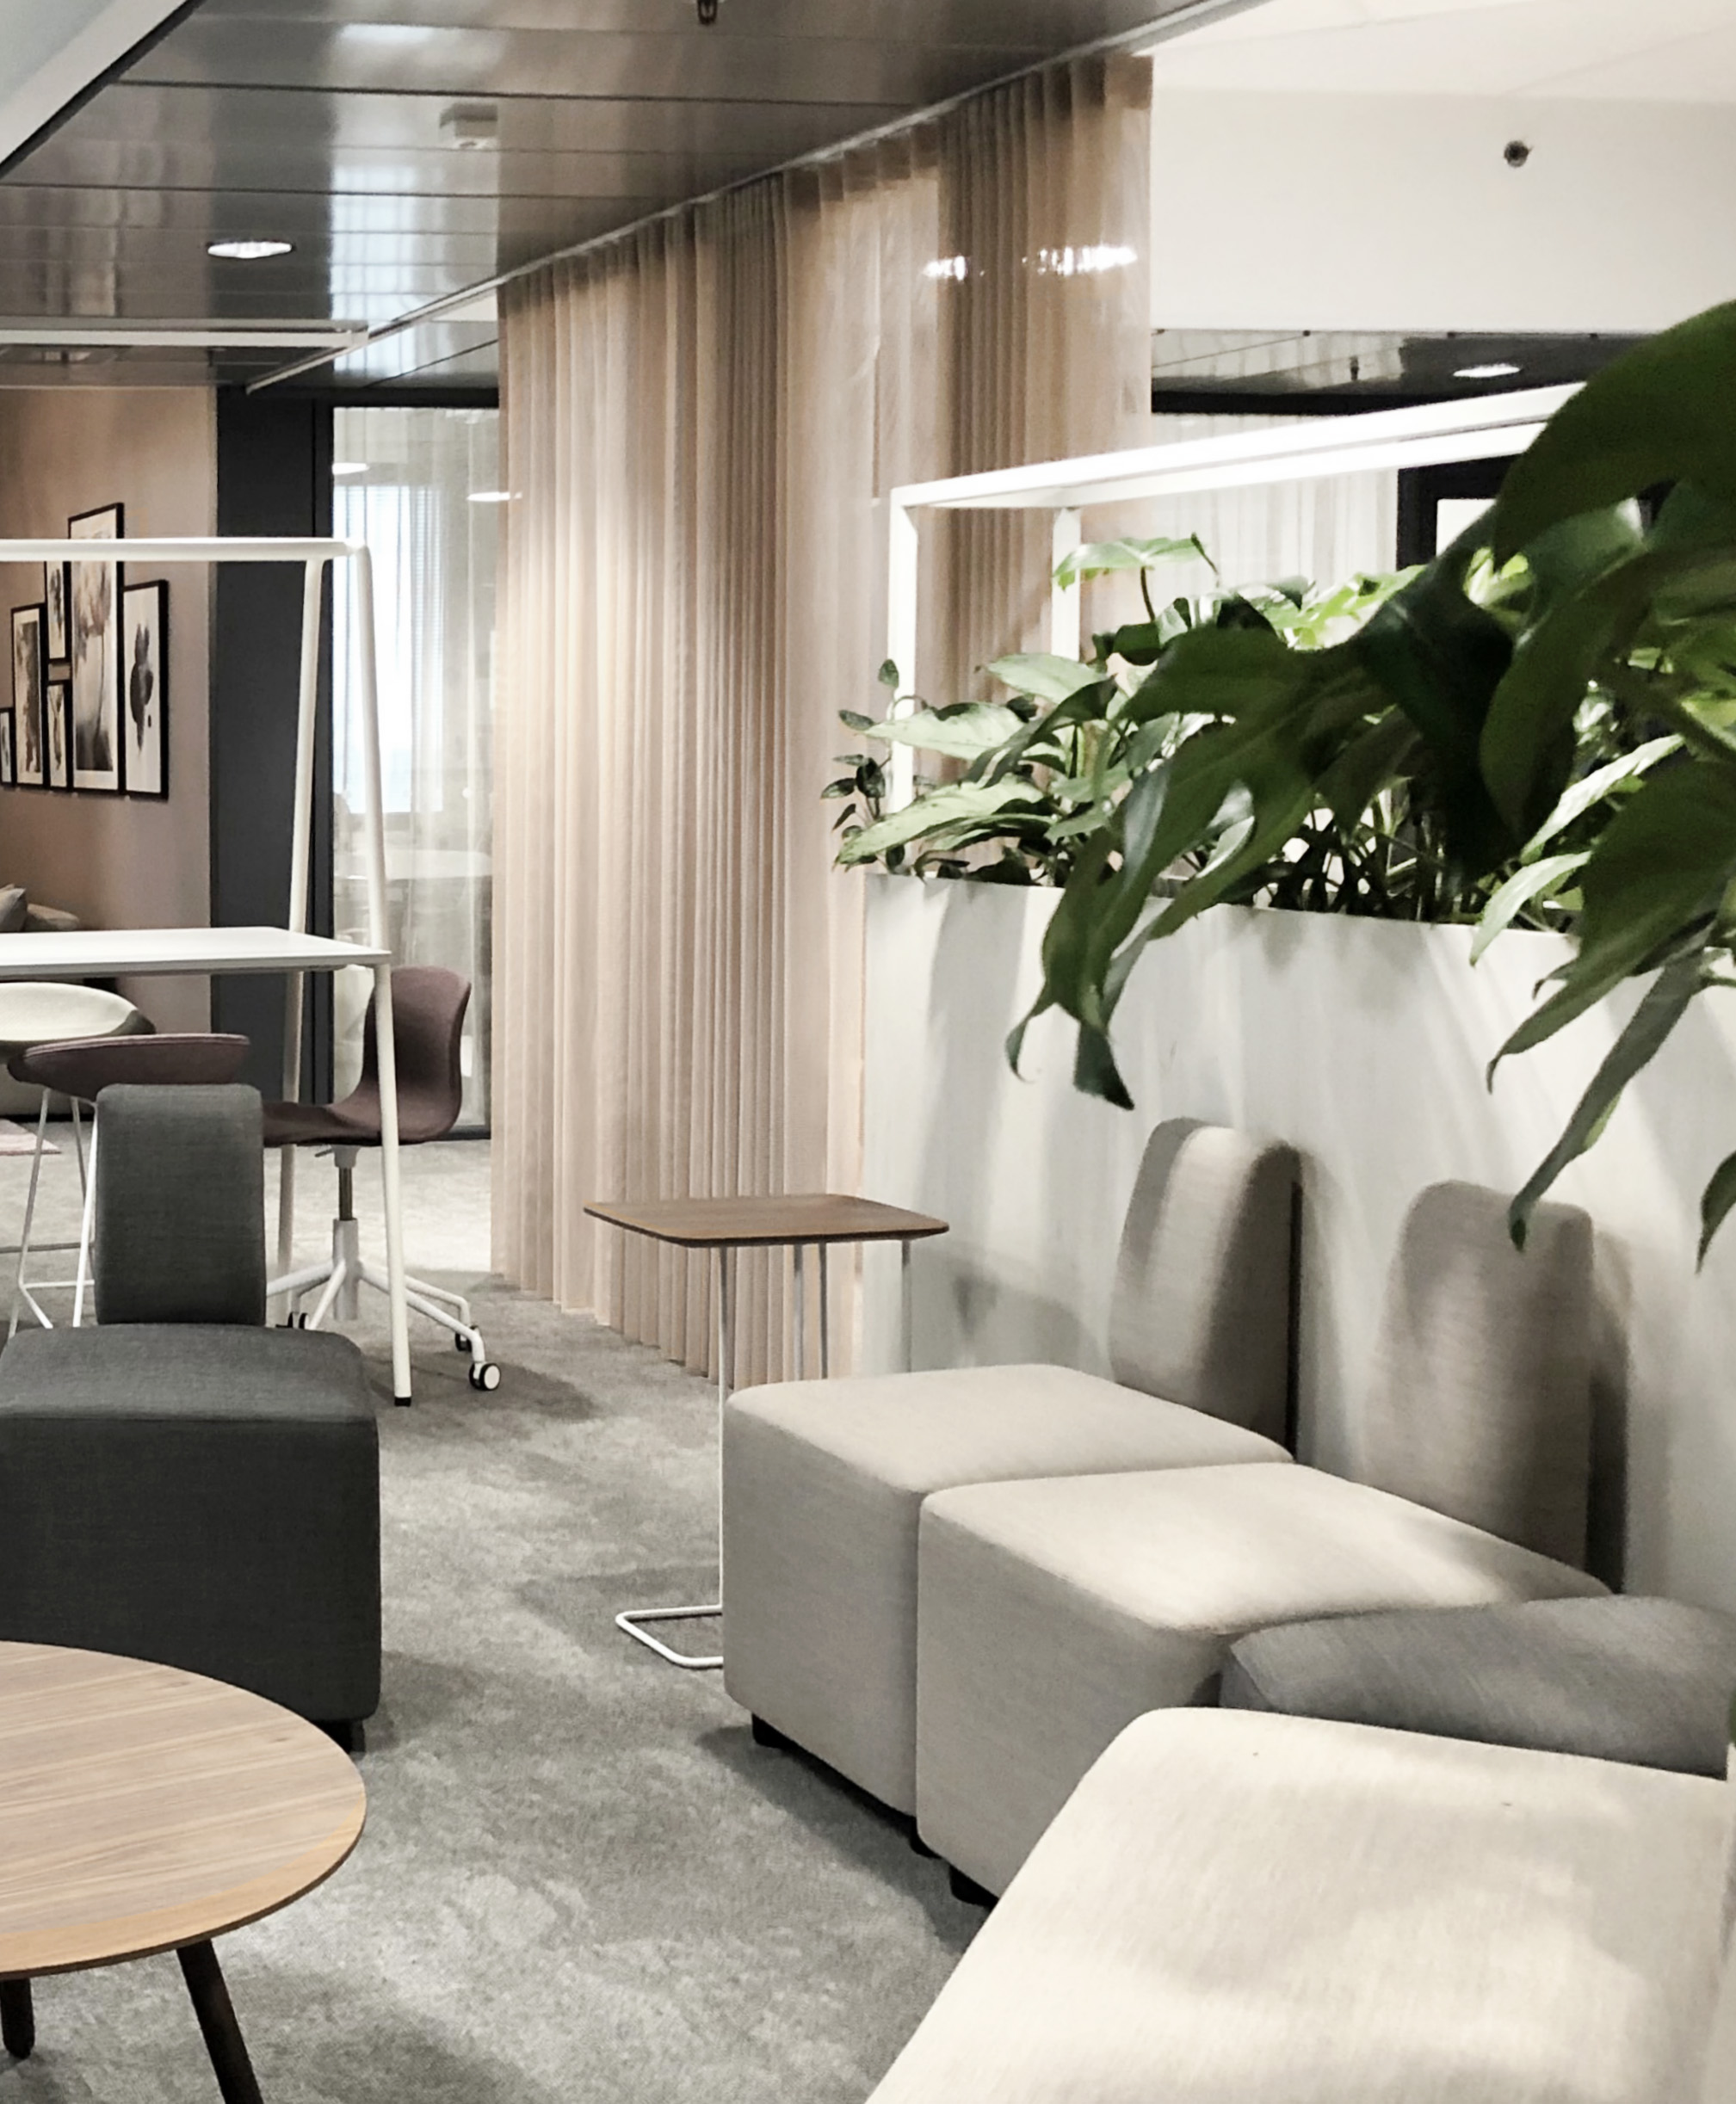 Mediplast Fenno Scope Design web14